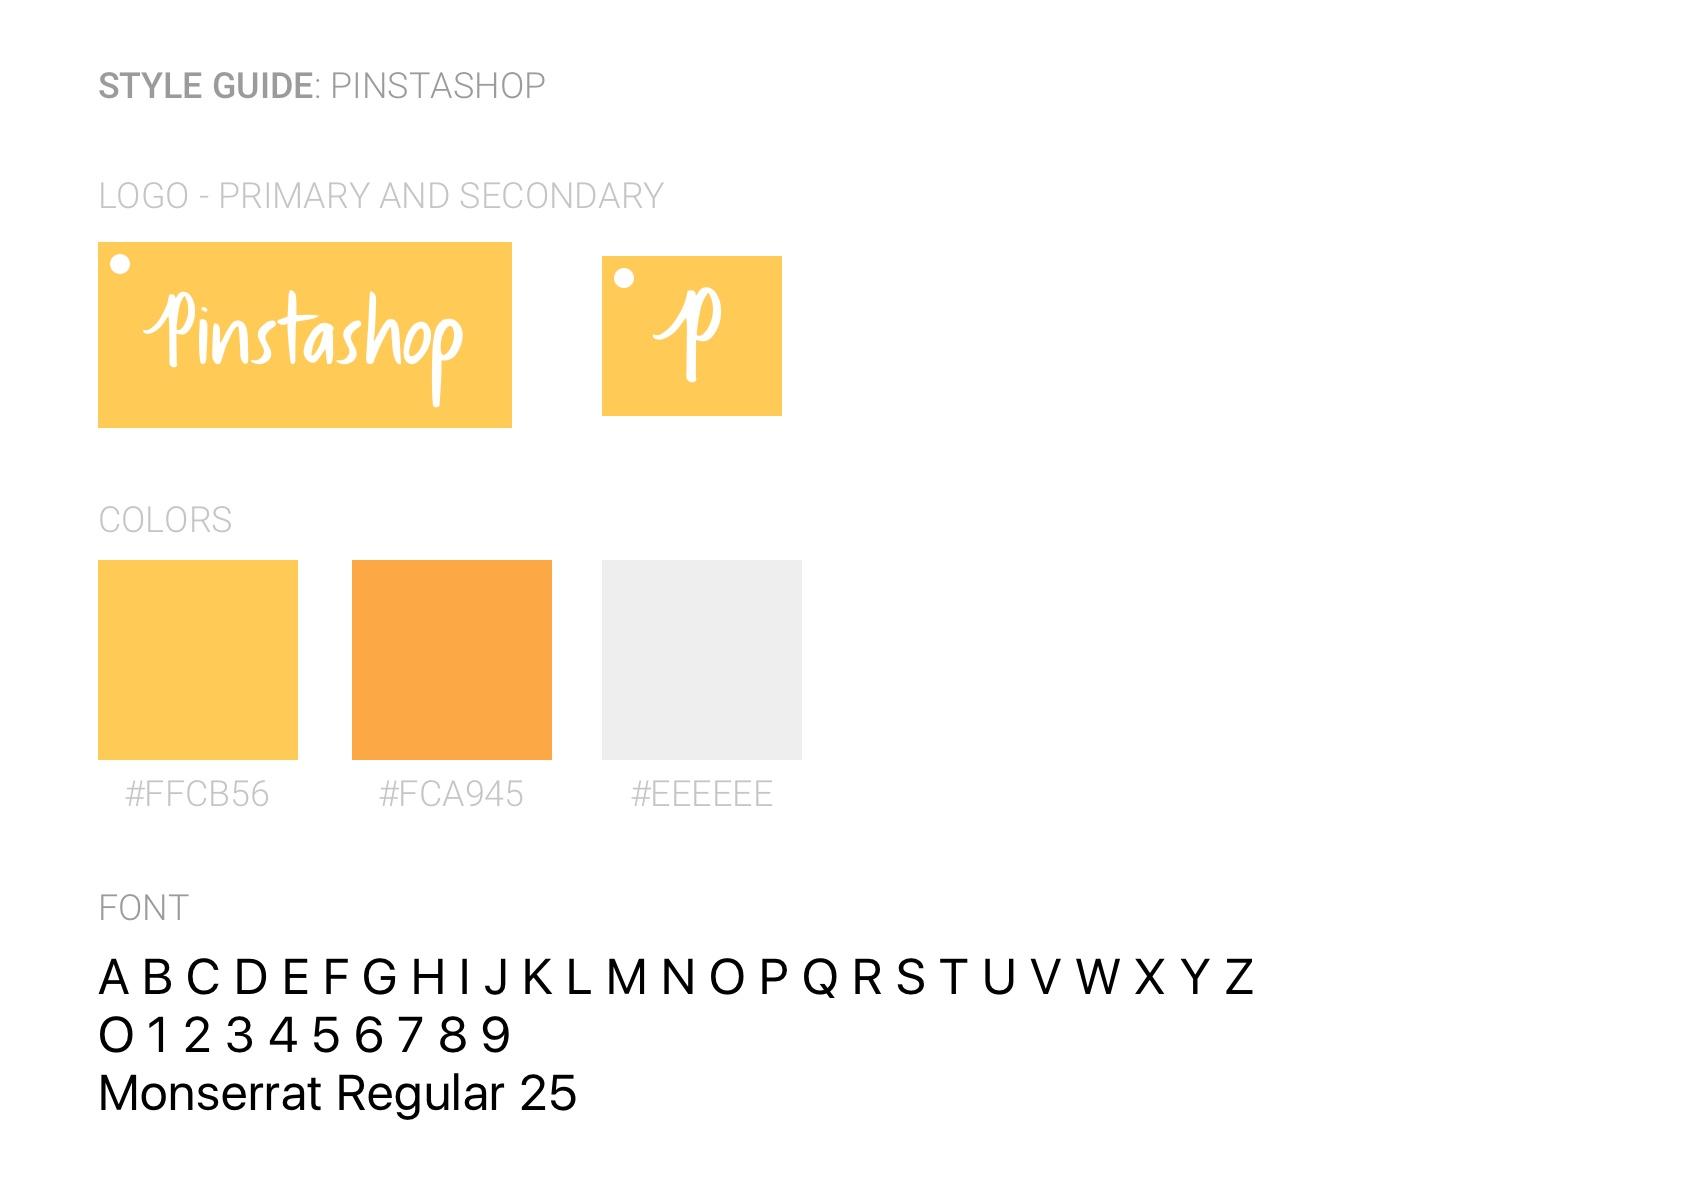 StyleGuide-Pinstashop-01.jpg